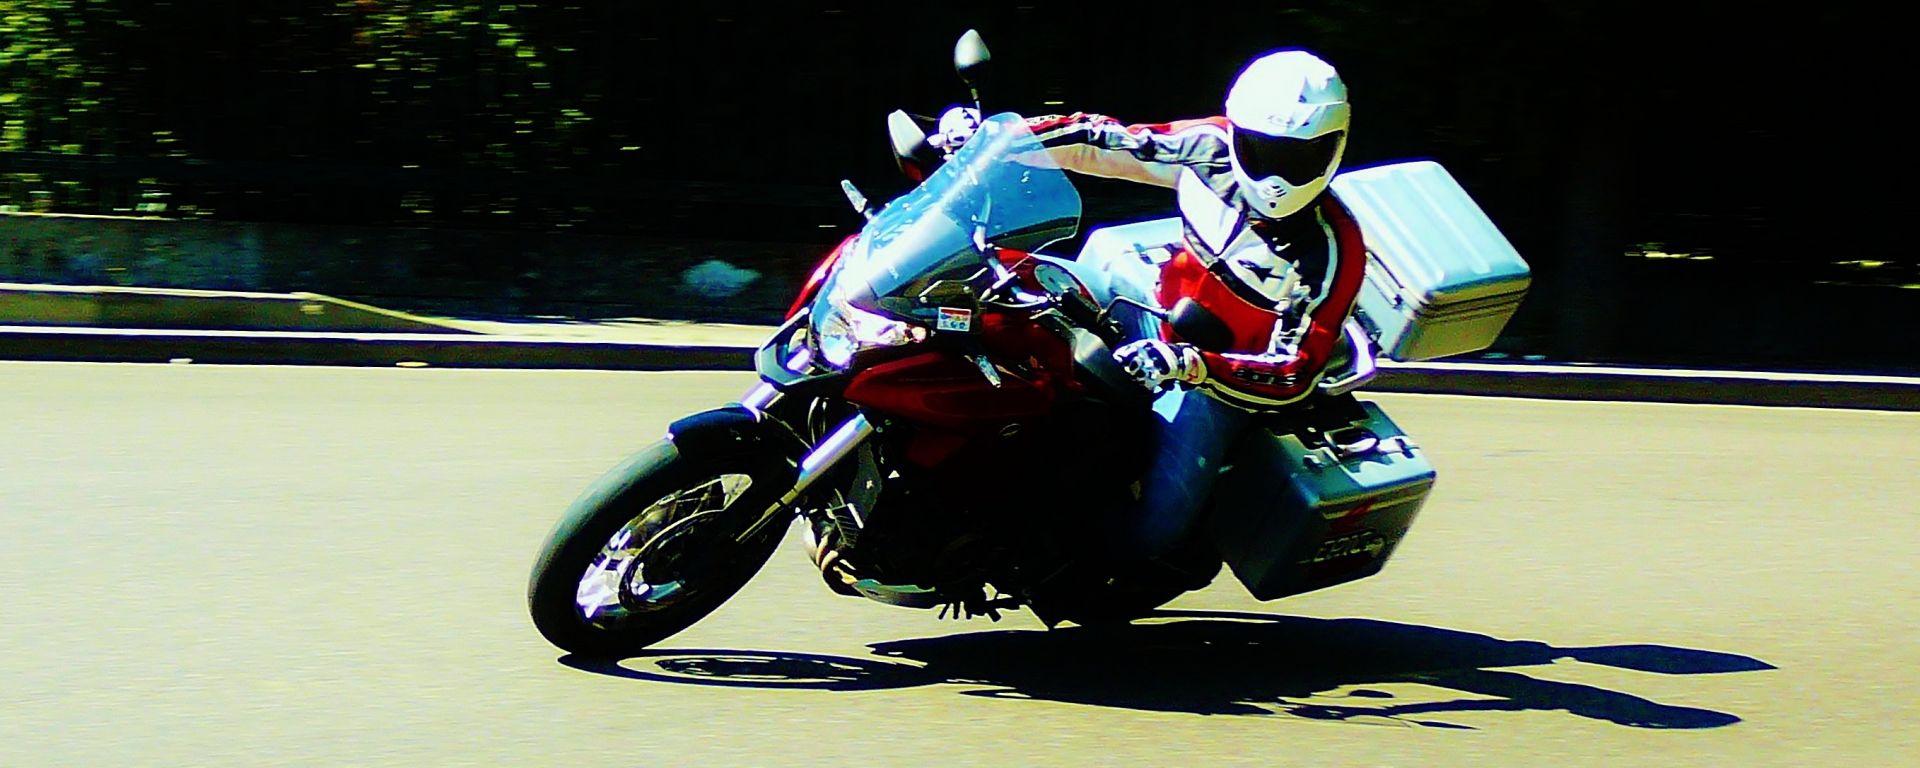 Test Drive: Honda Crosstourer 1200 - MotorBox